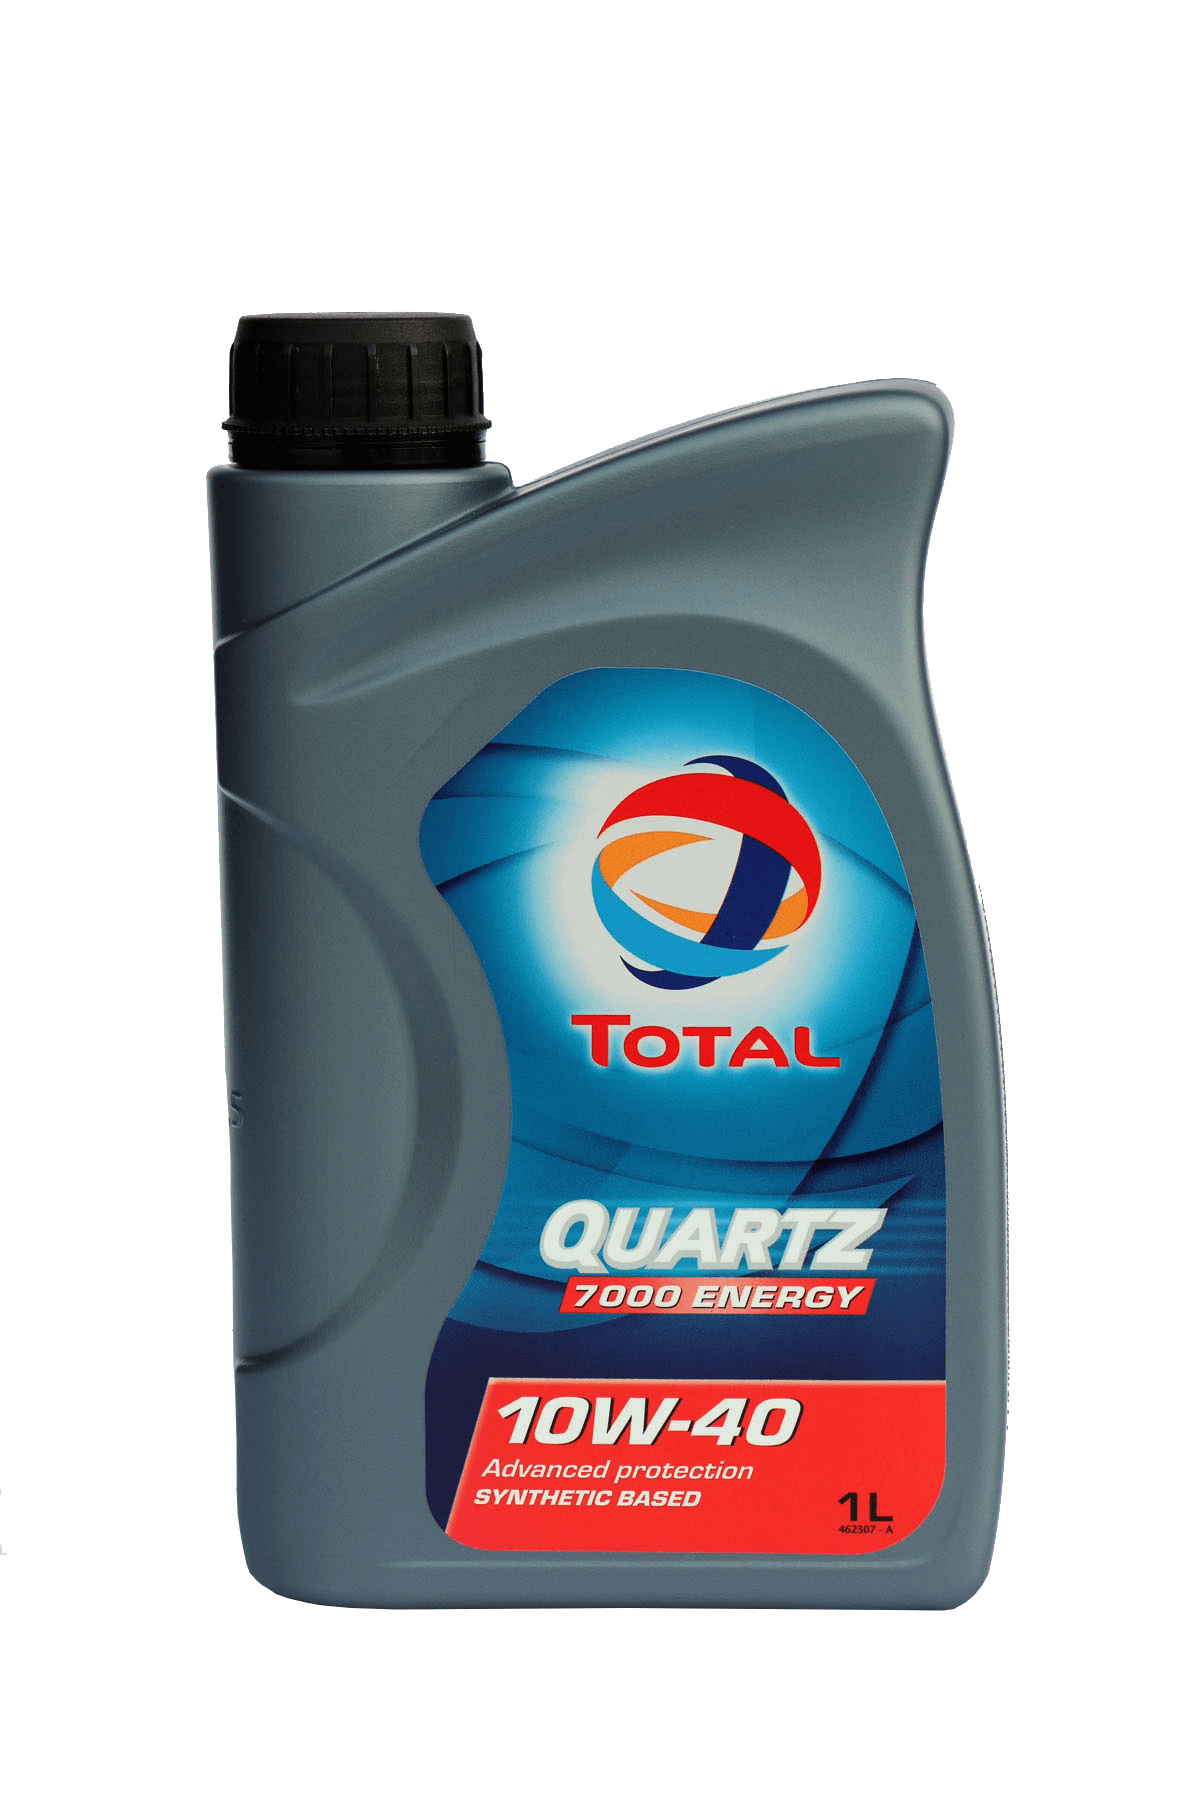 Total Quartz 7000 ENERGY 10W-40 Motoröl, 1l